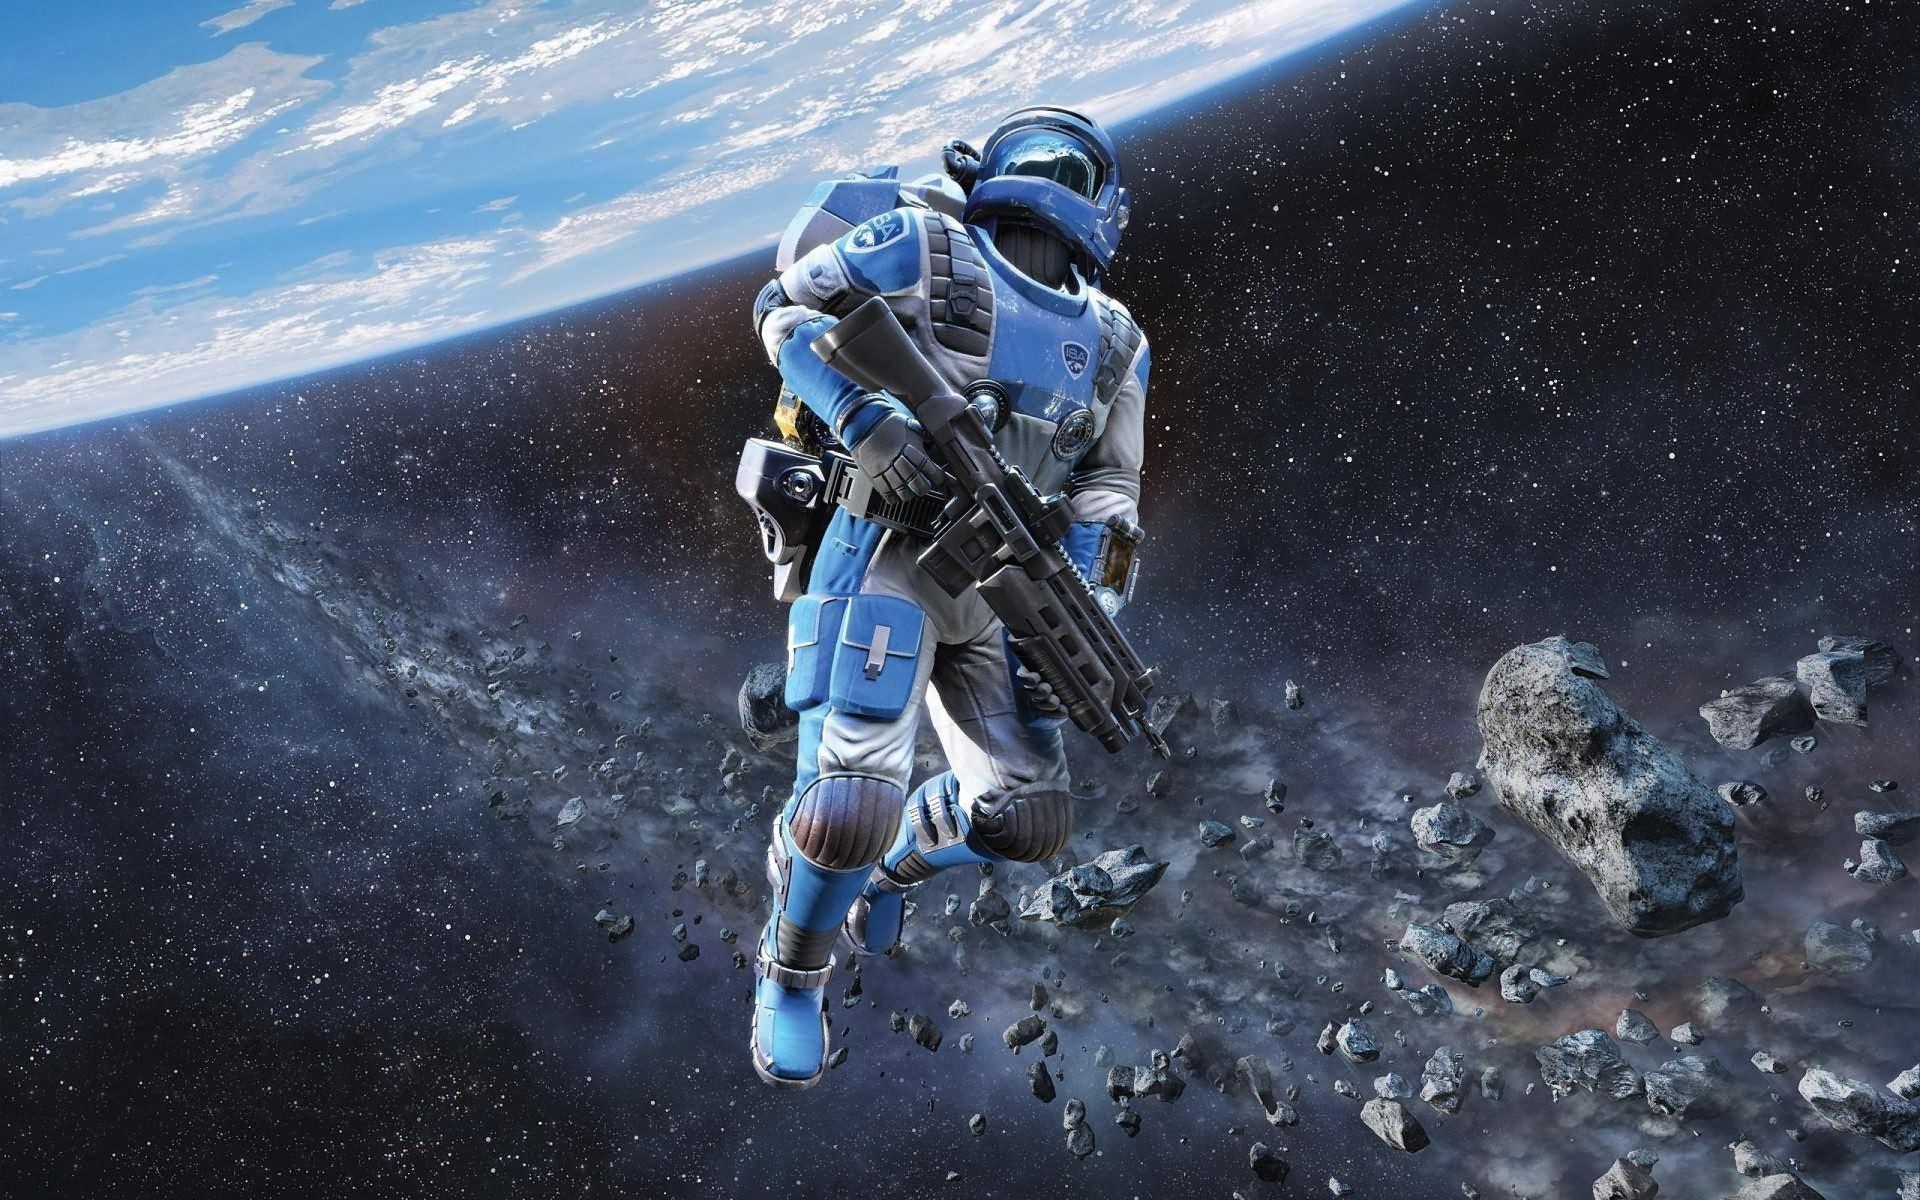 Retro Sci Fi Wallpaper 67 images